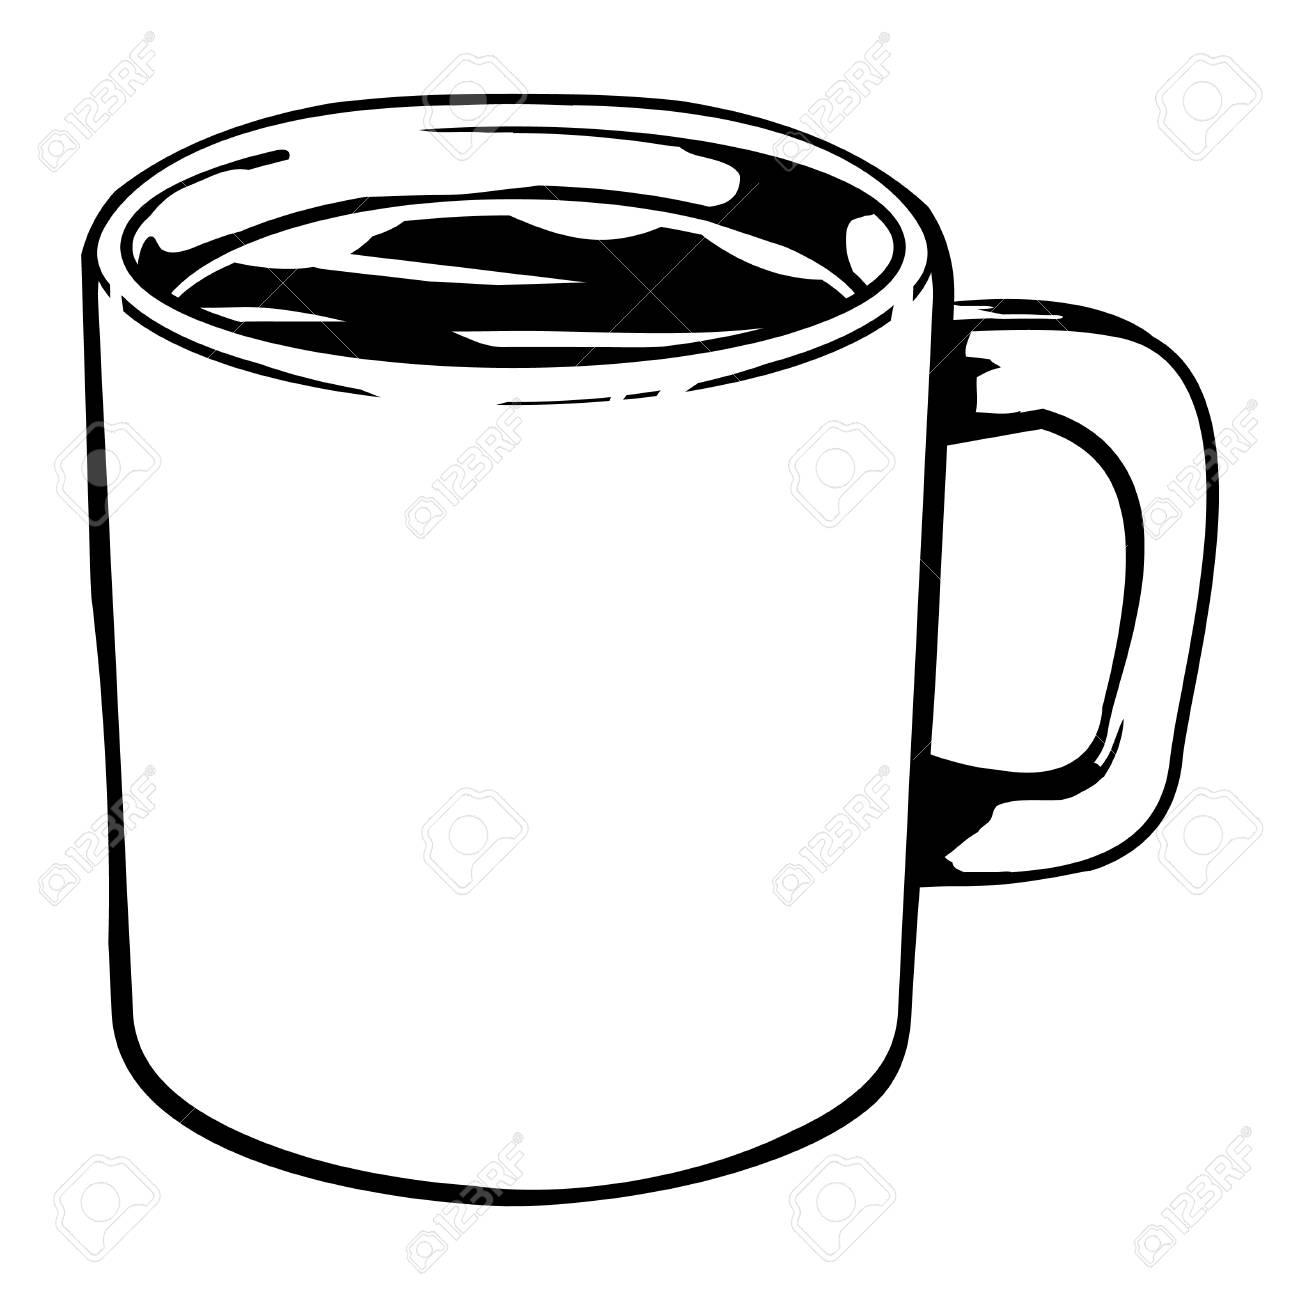 Coffee Mug Vector Icon Royalty Free Cliparts Vectors And Stock Illustration Image 49536819